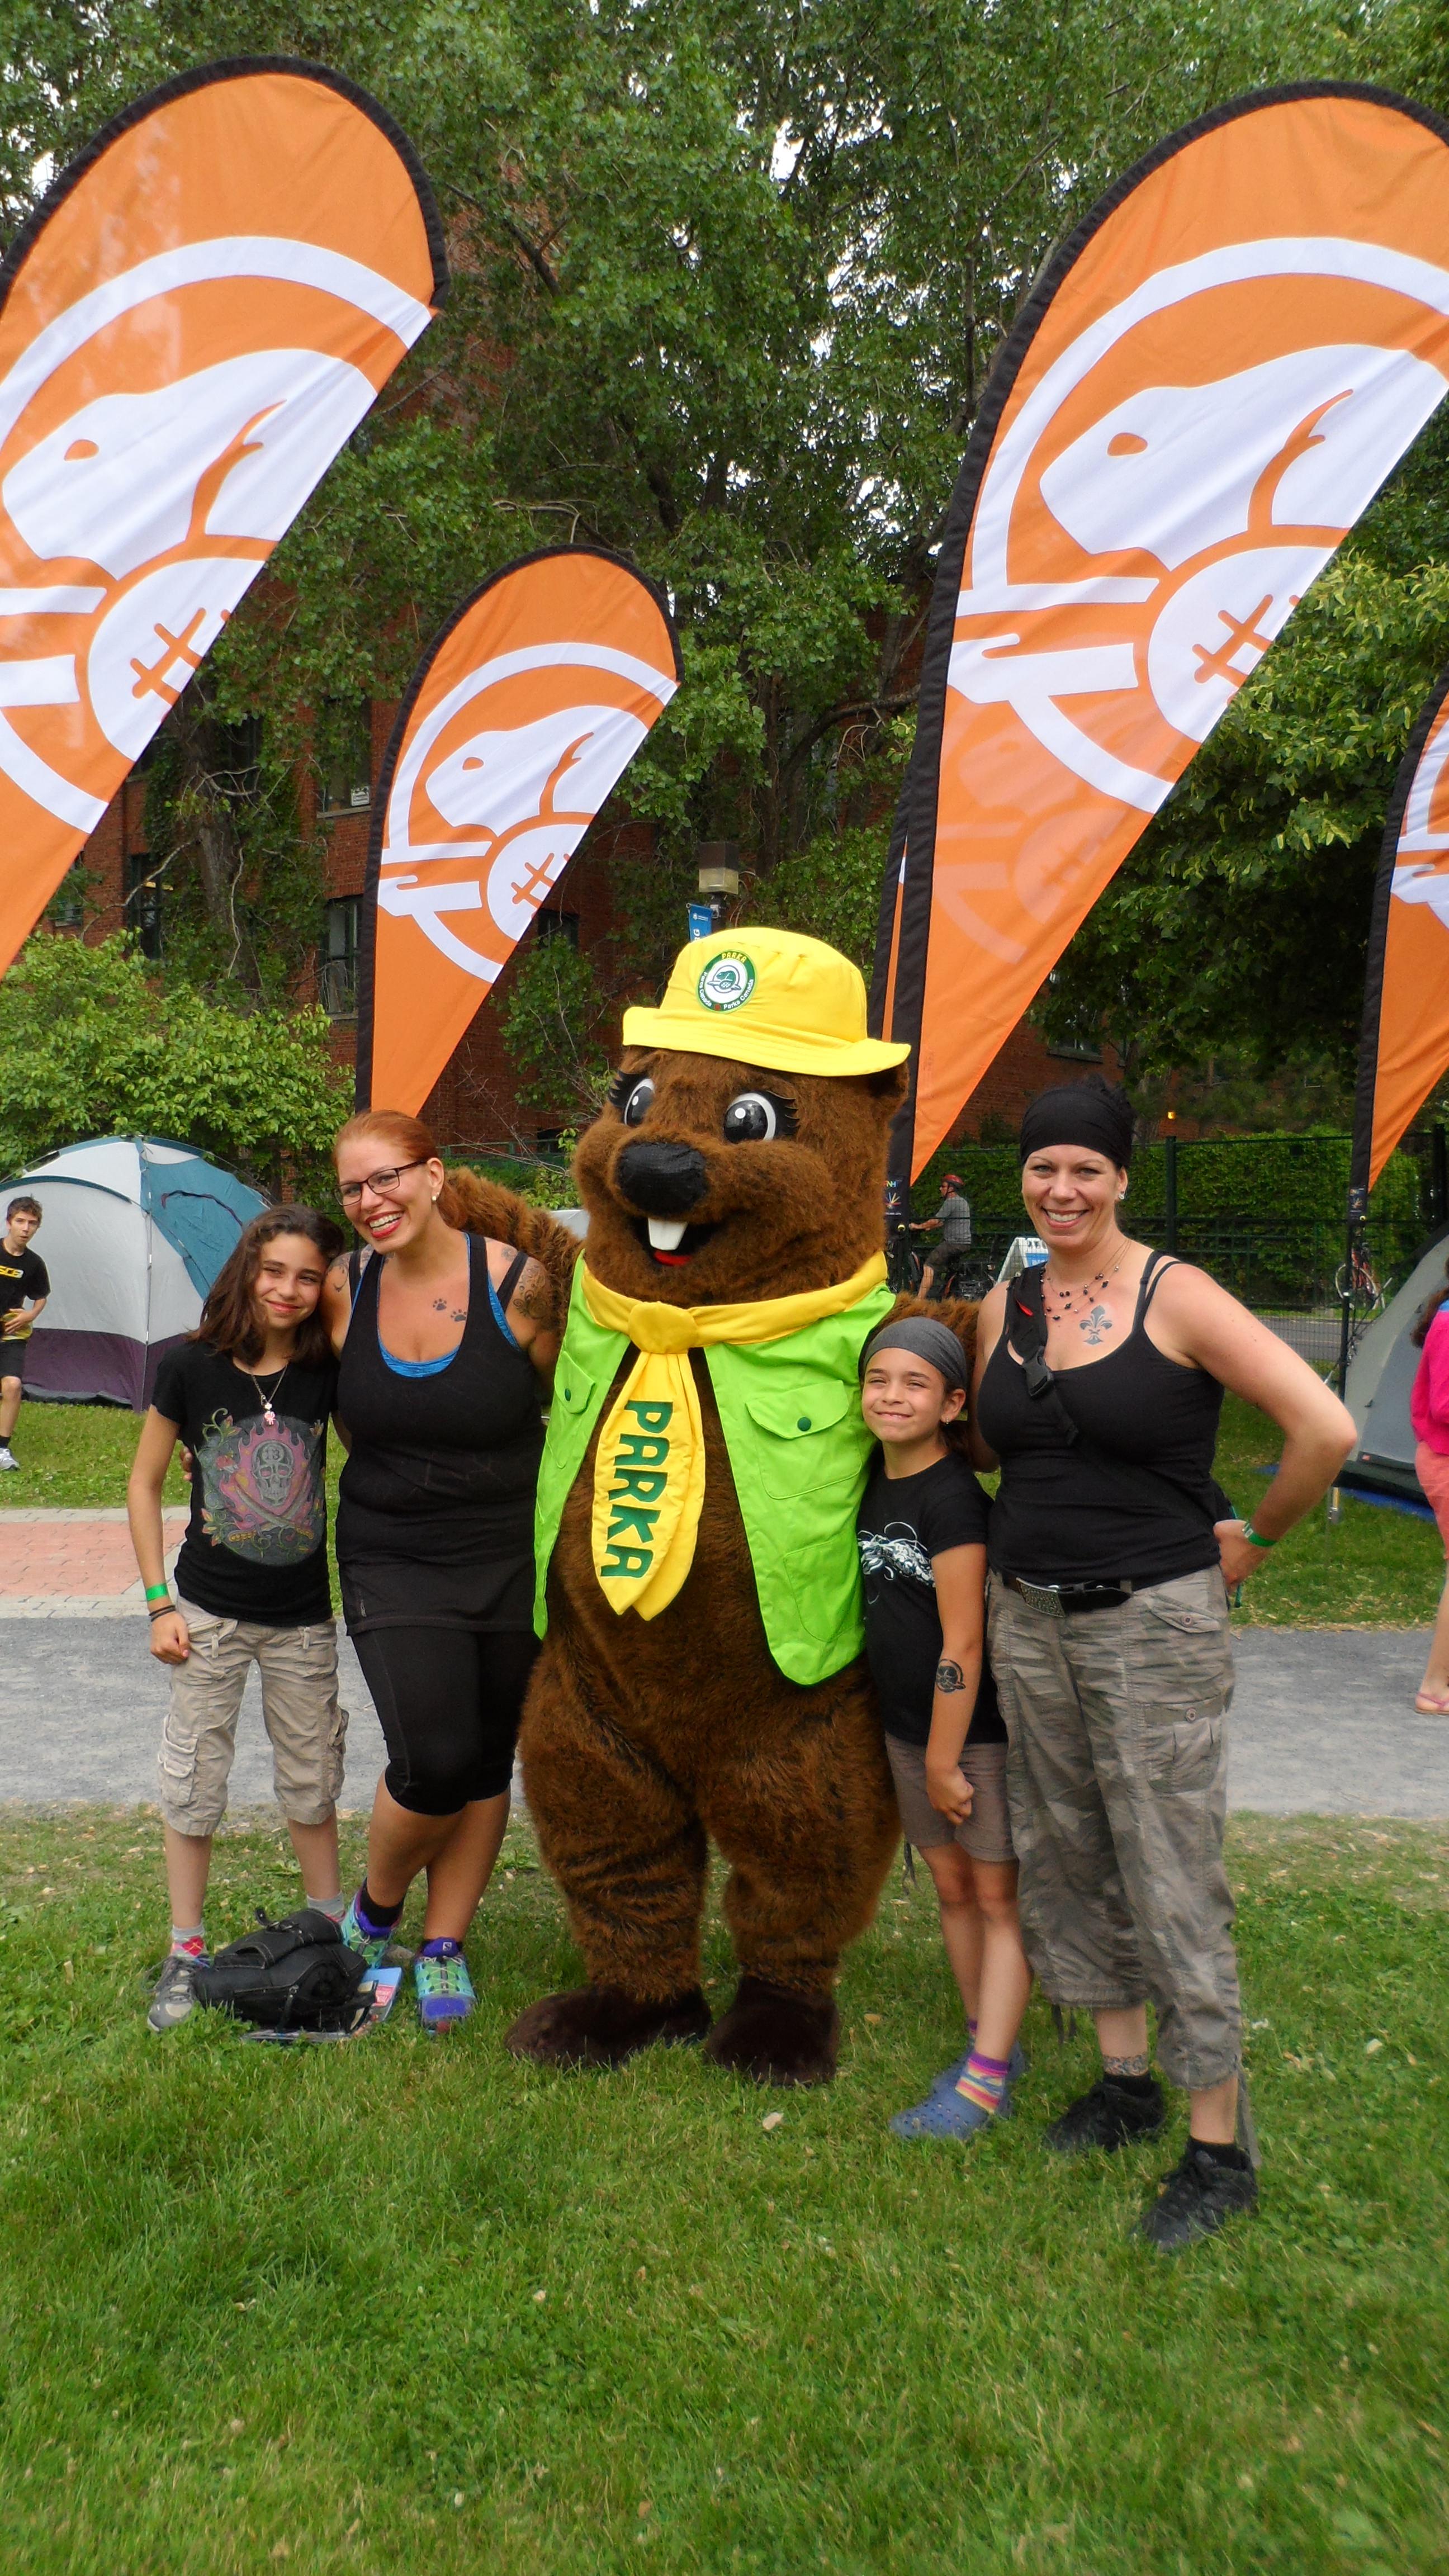 En compagnie de Parka, la mascotte de Parcs Canada